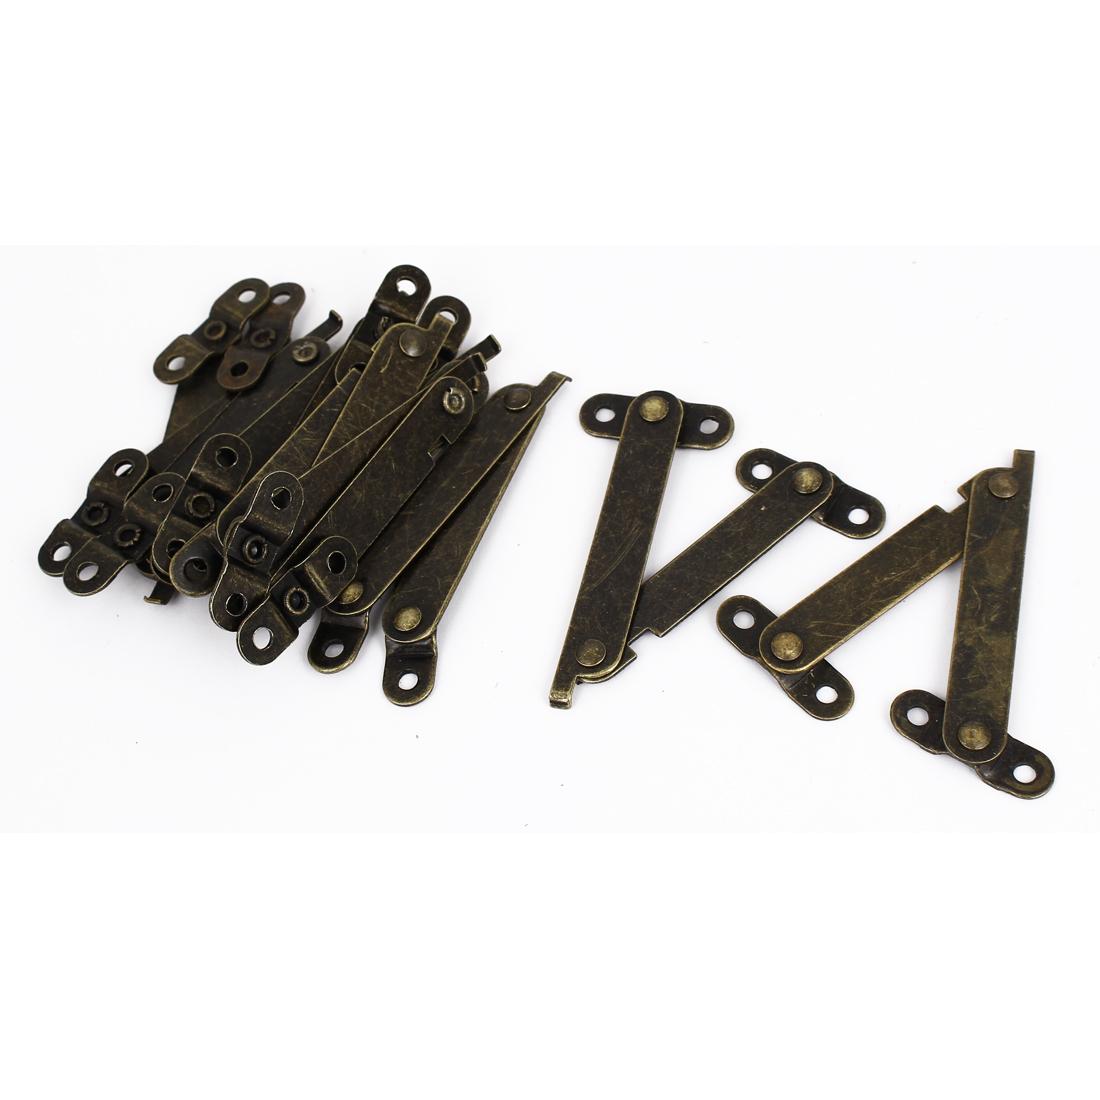 10pcs Furniture Box Rotatable Folding Lid Support Hinge Bronze Tone 11.5cm Long